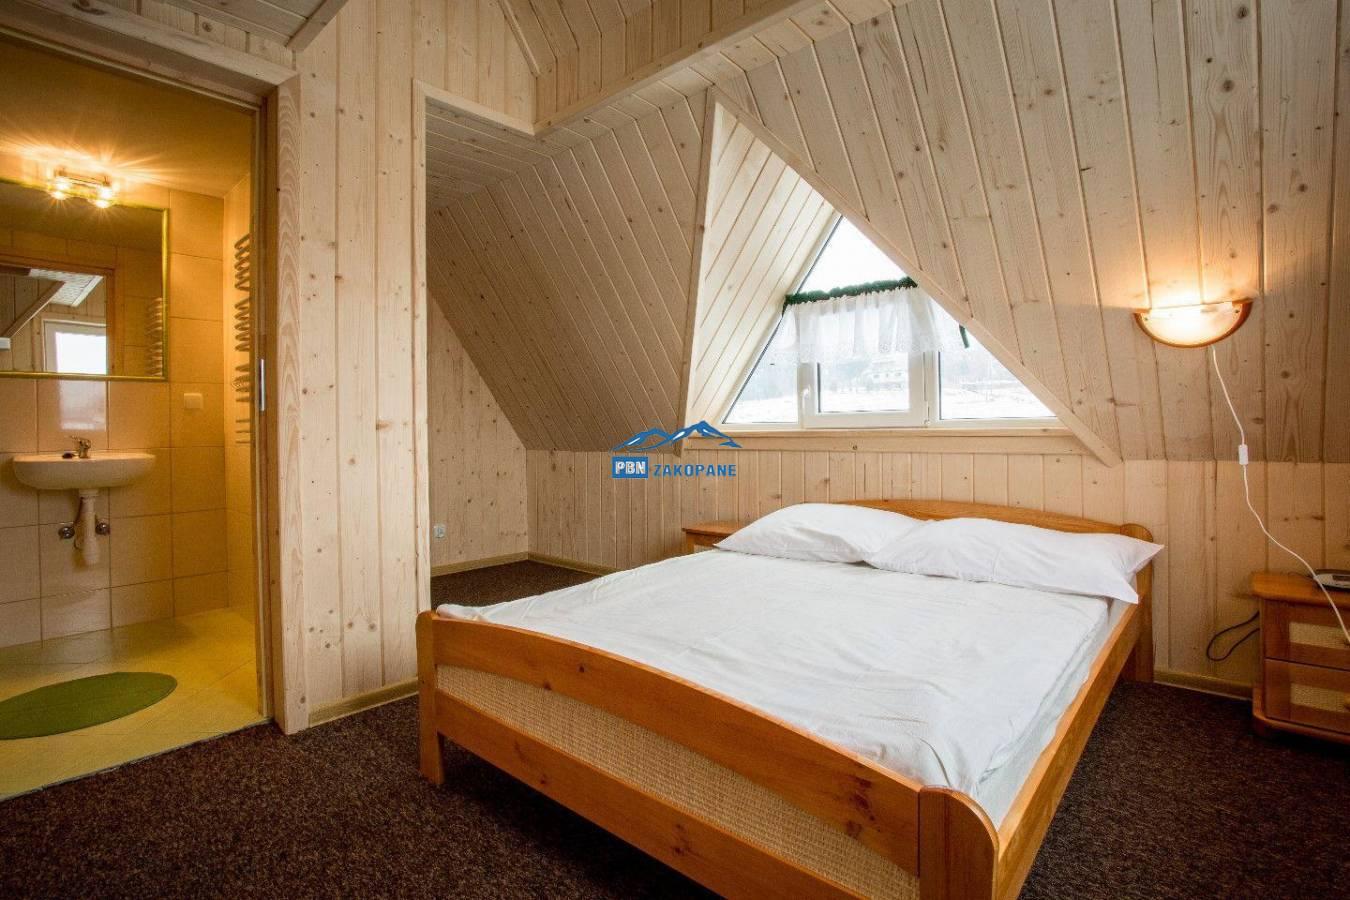 Willa IZYDOR komfortowe pokoje